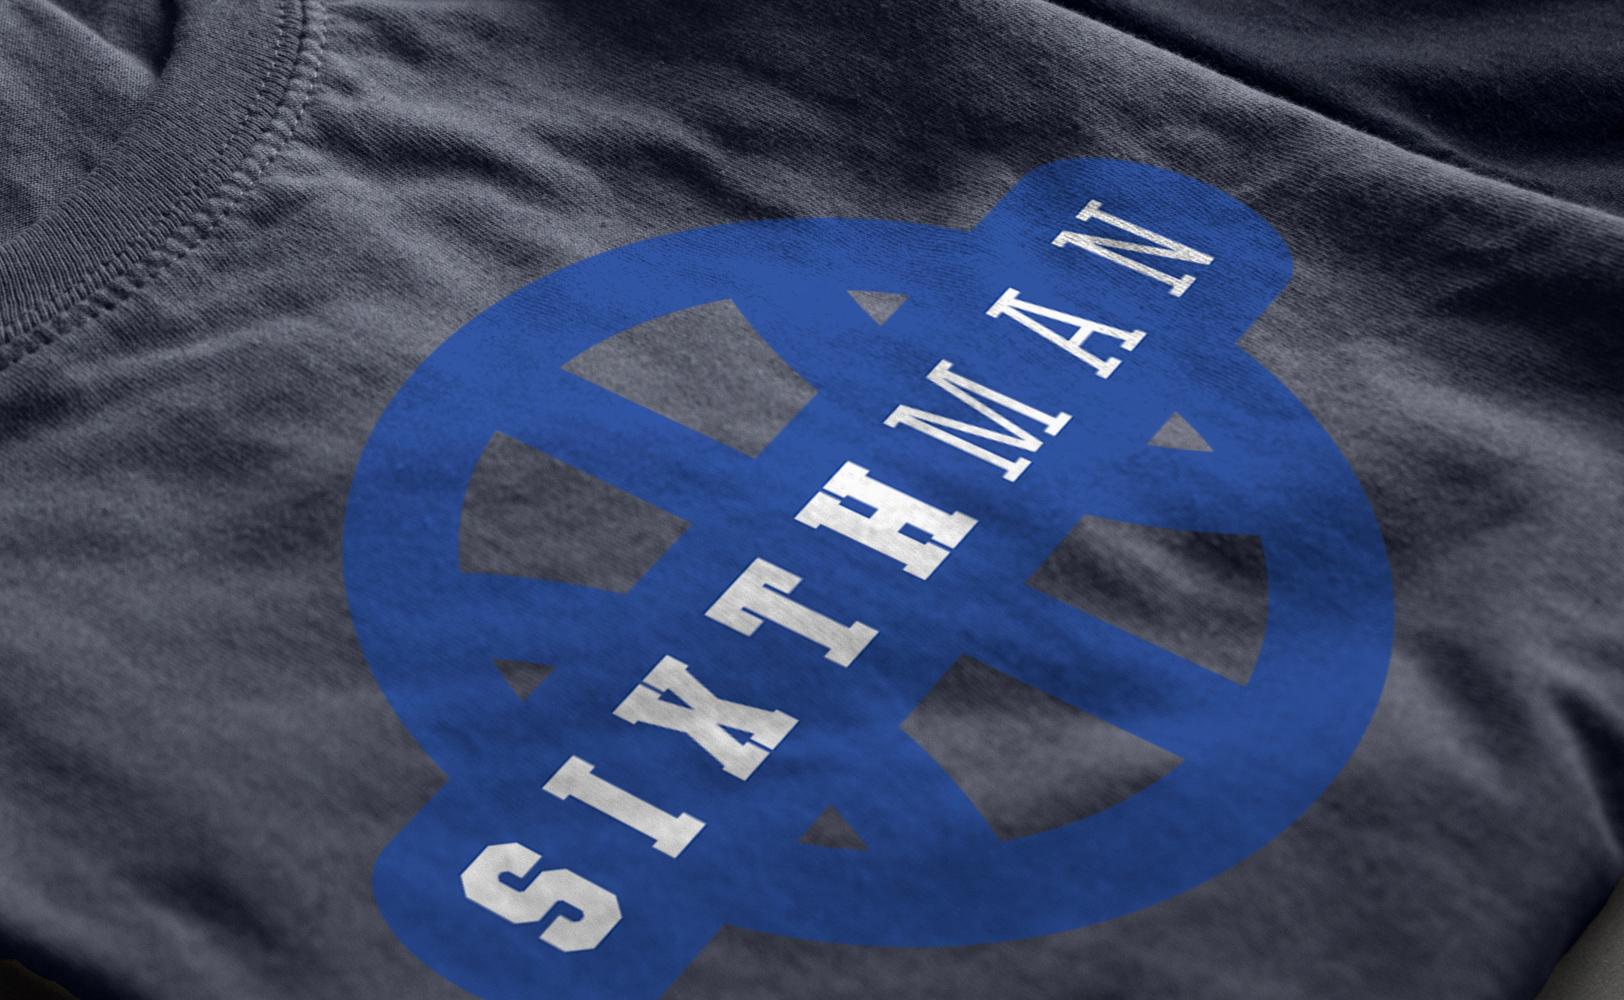 Sports branding logo on a Sixth Man documentary t-shirt